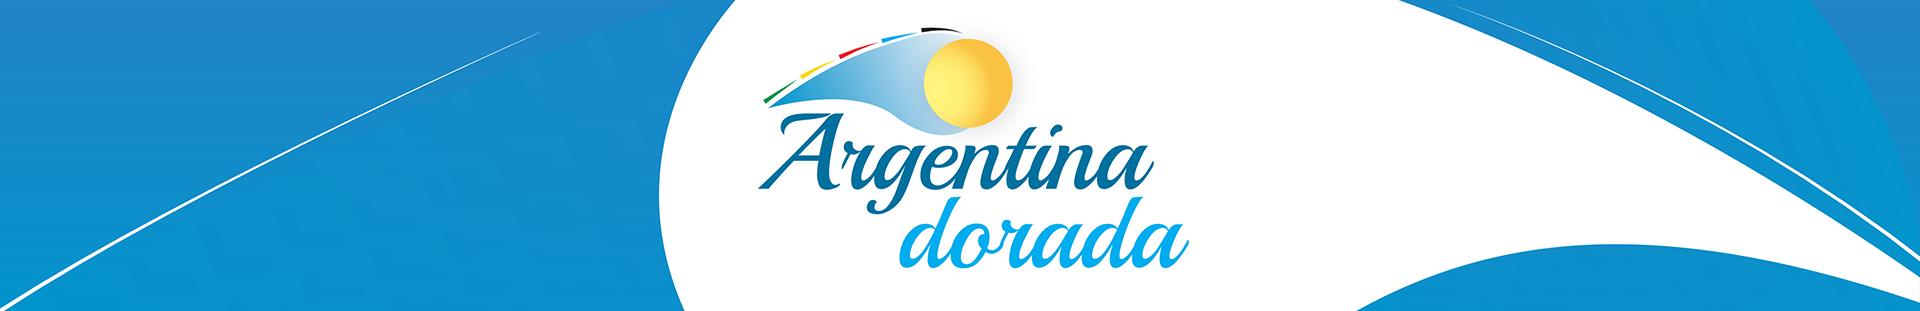 Argentina Dorada